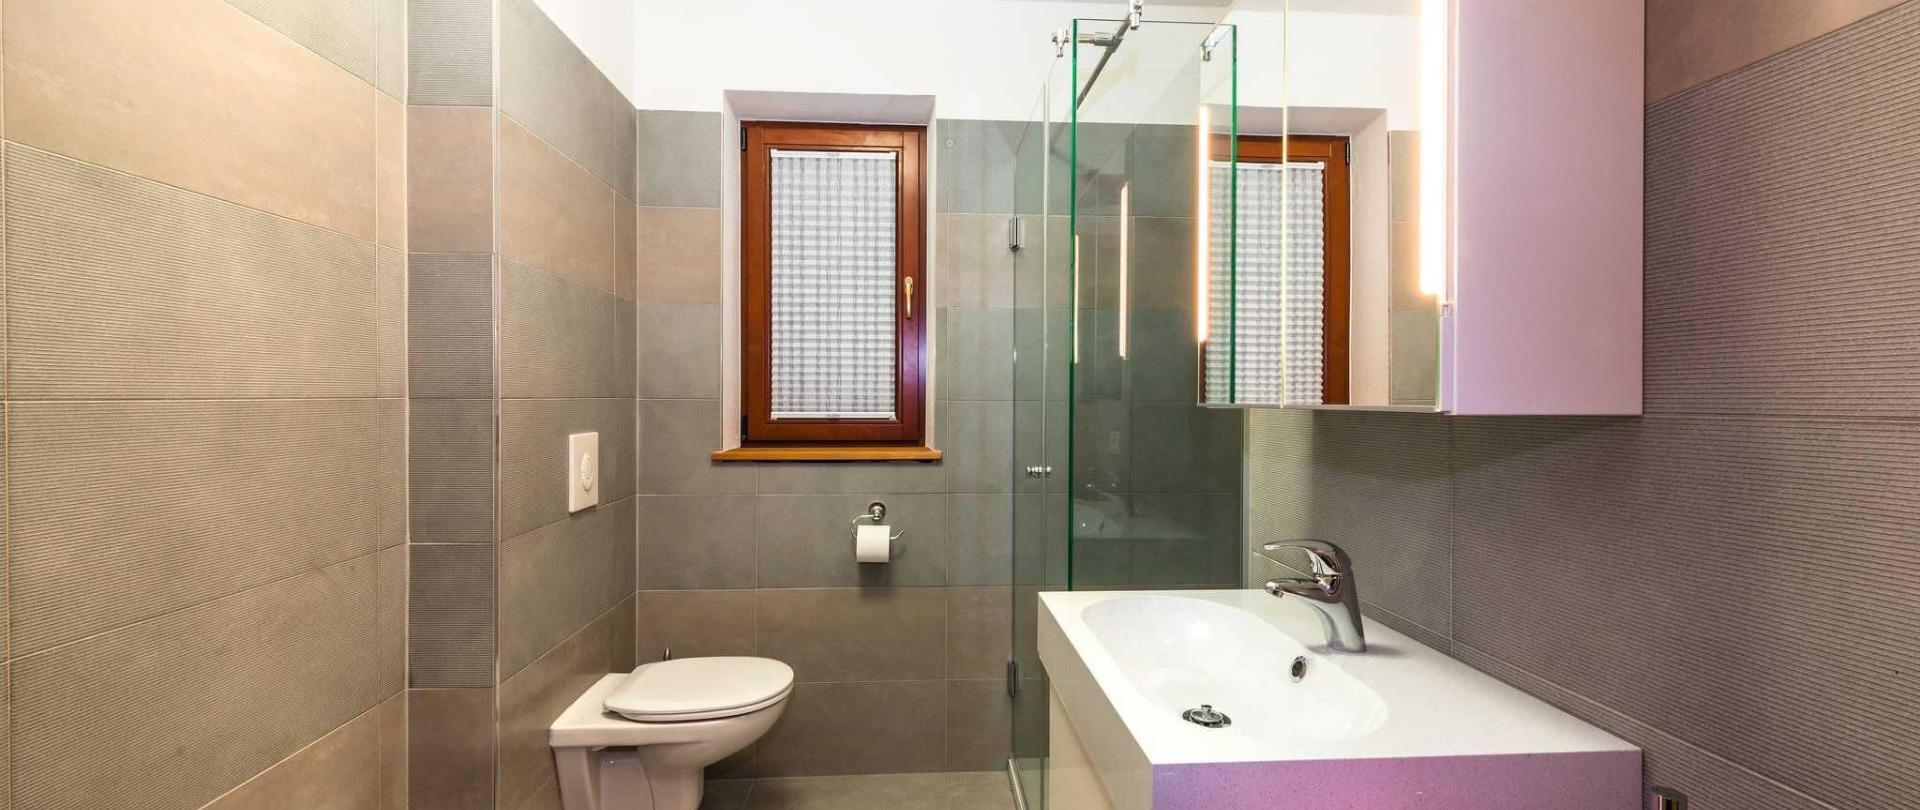 typ-b-badezimmer-3.jpg